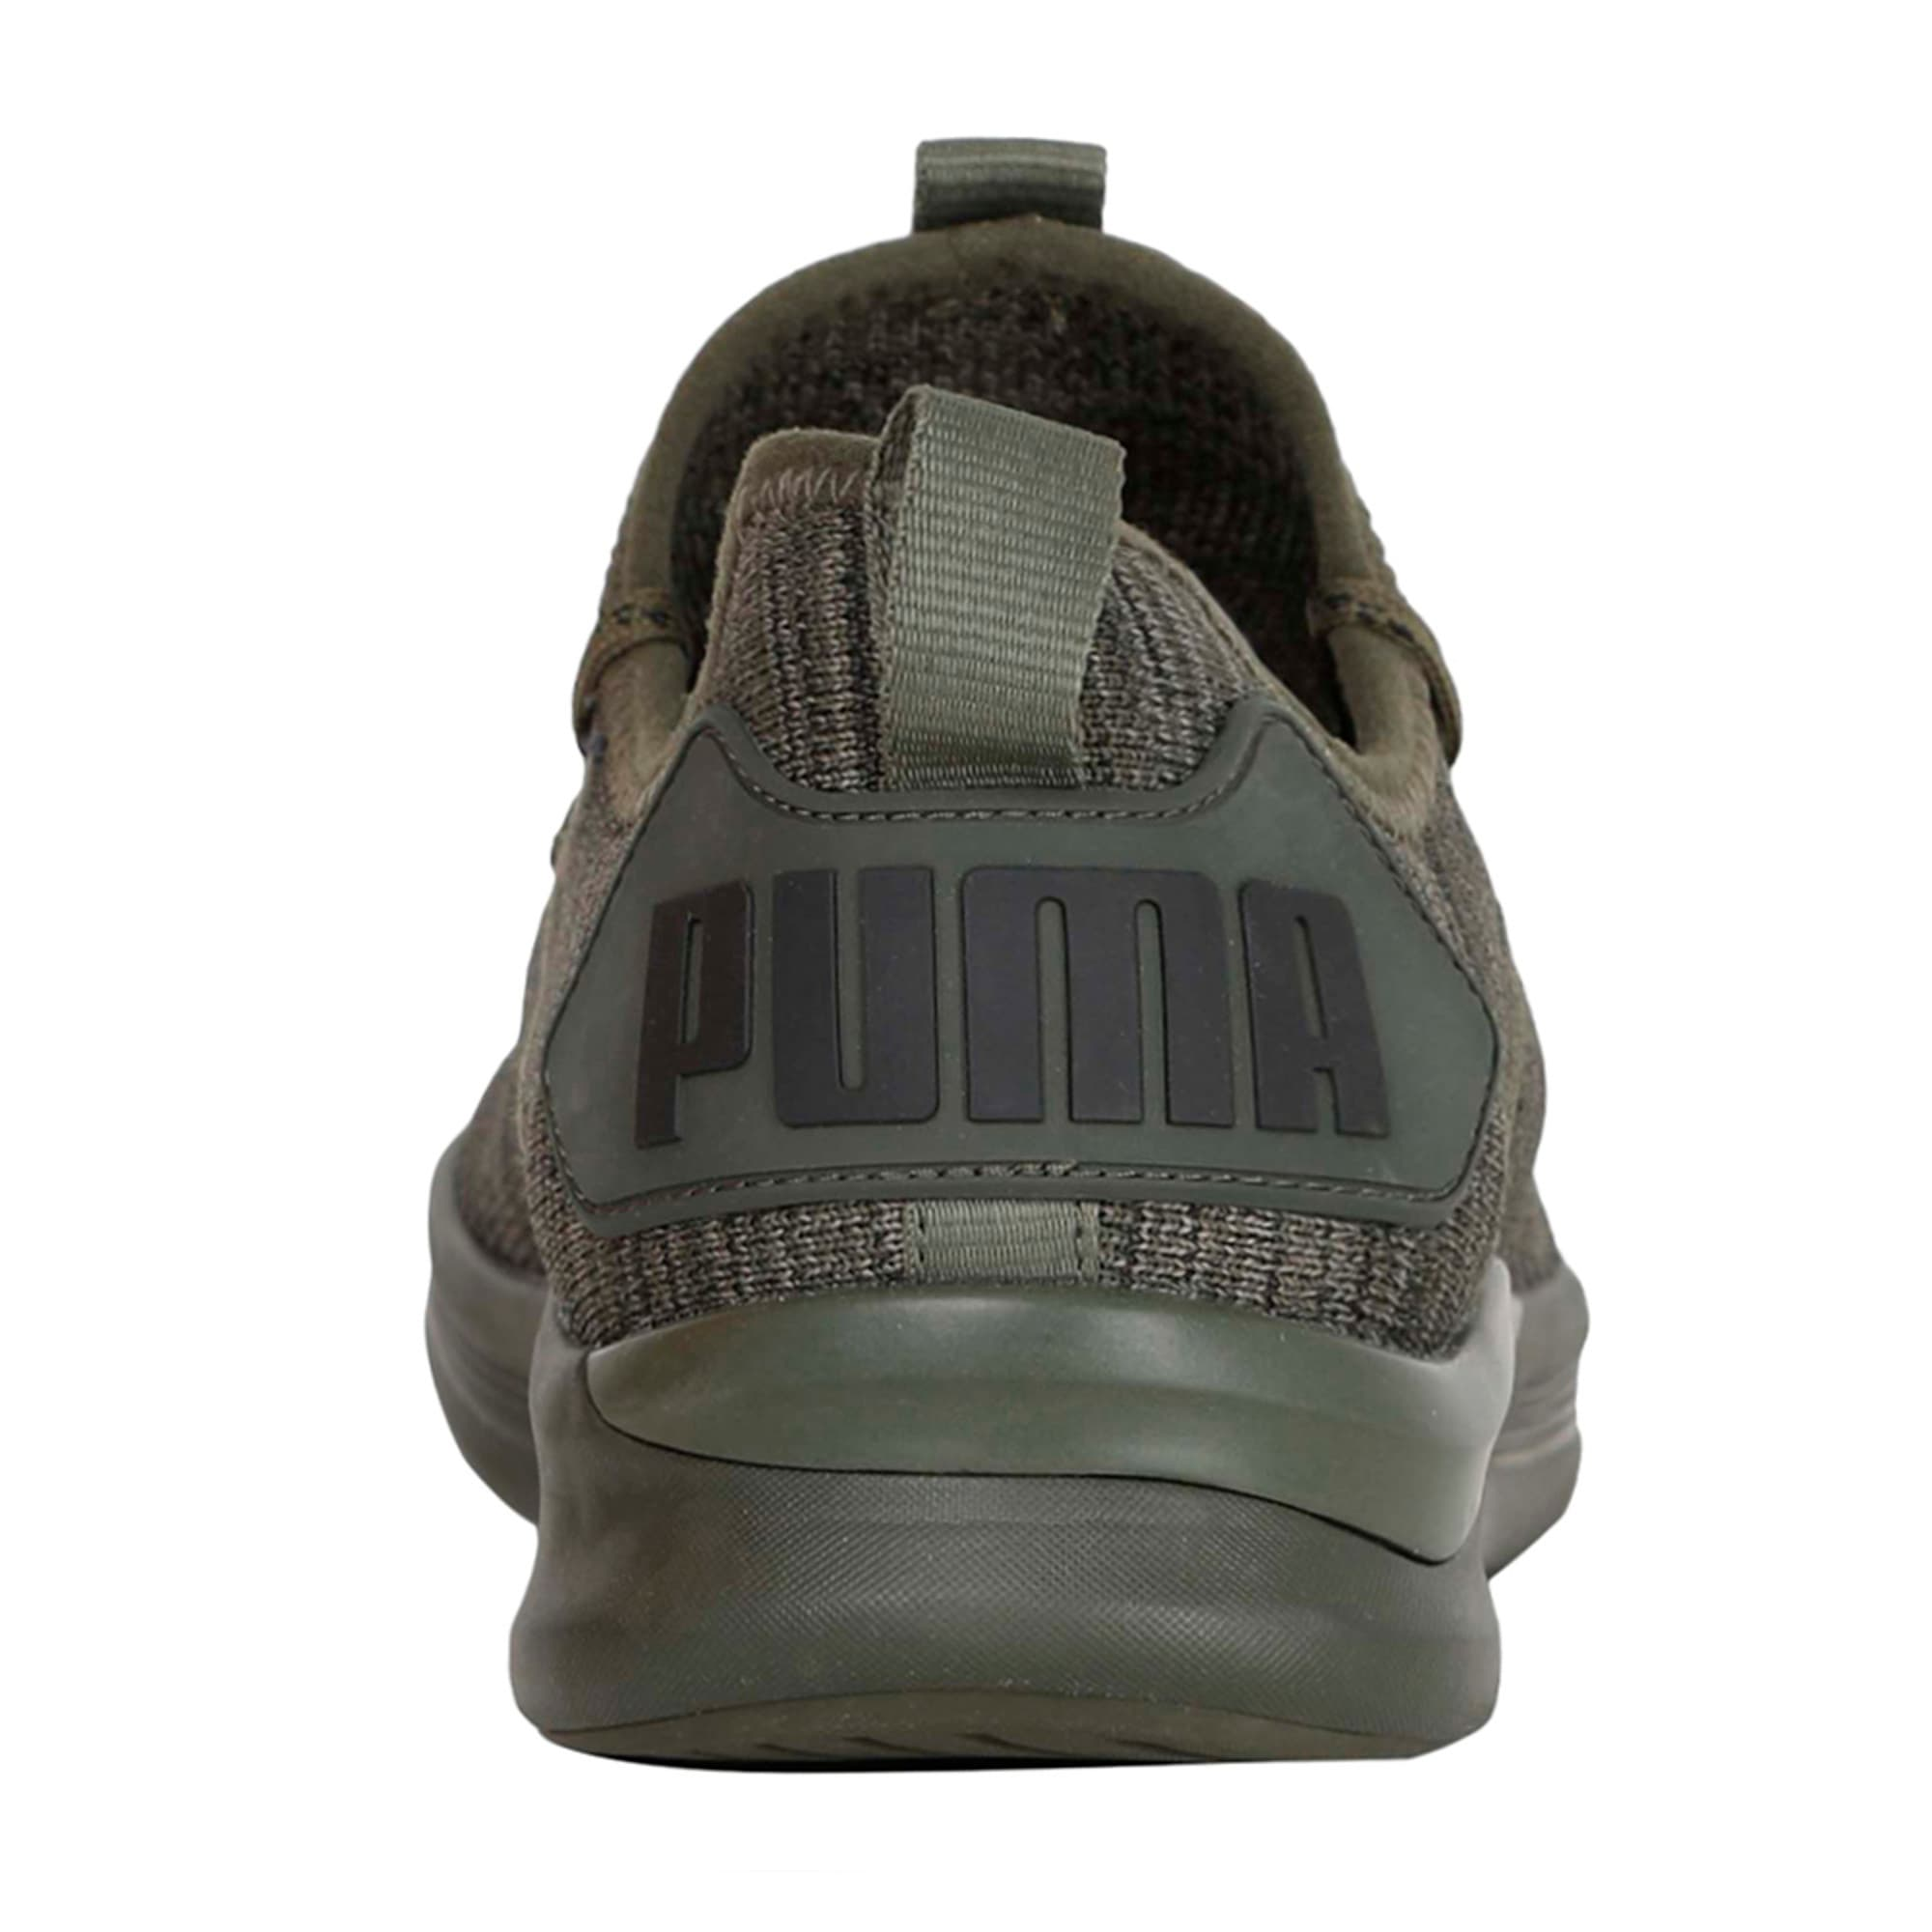 Thumbnail 5 of IGNITE Flash evoKNIT Men's Training Shoes, Forest Night-Gray-Black, medium-IND